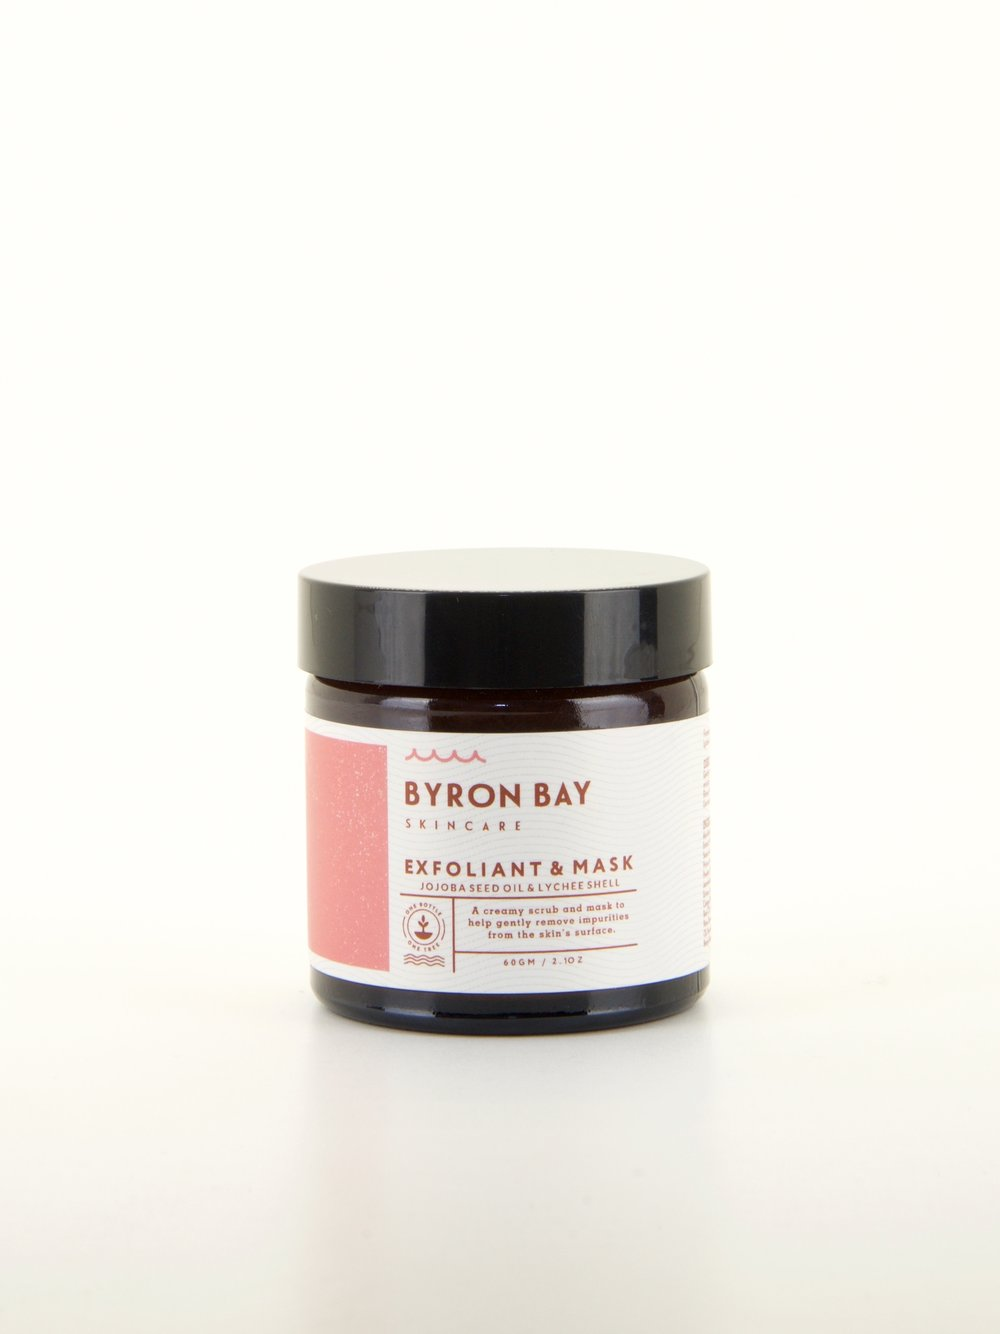 Byron Bay Skincare Exfoliant and Mask £23.20